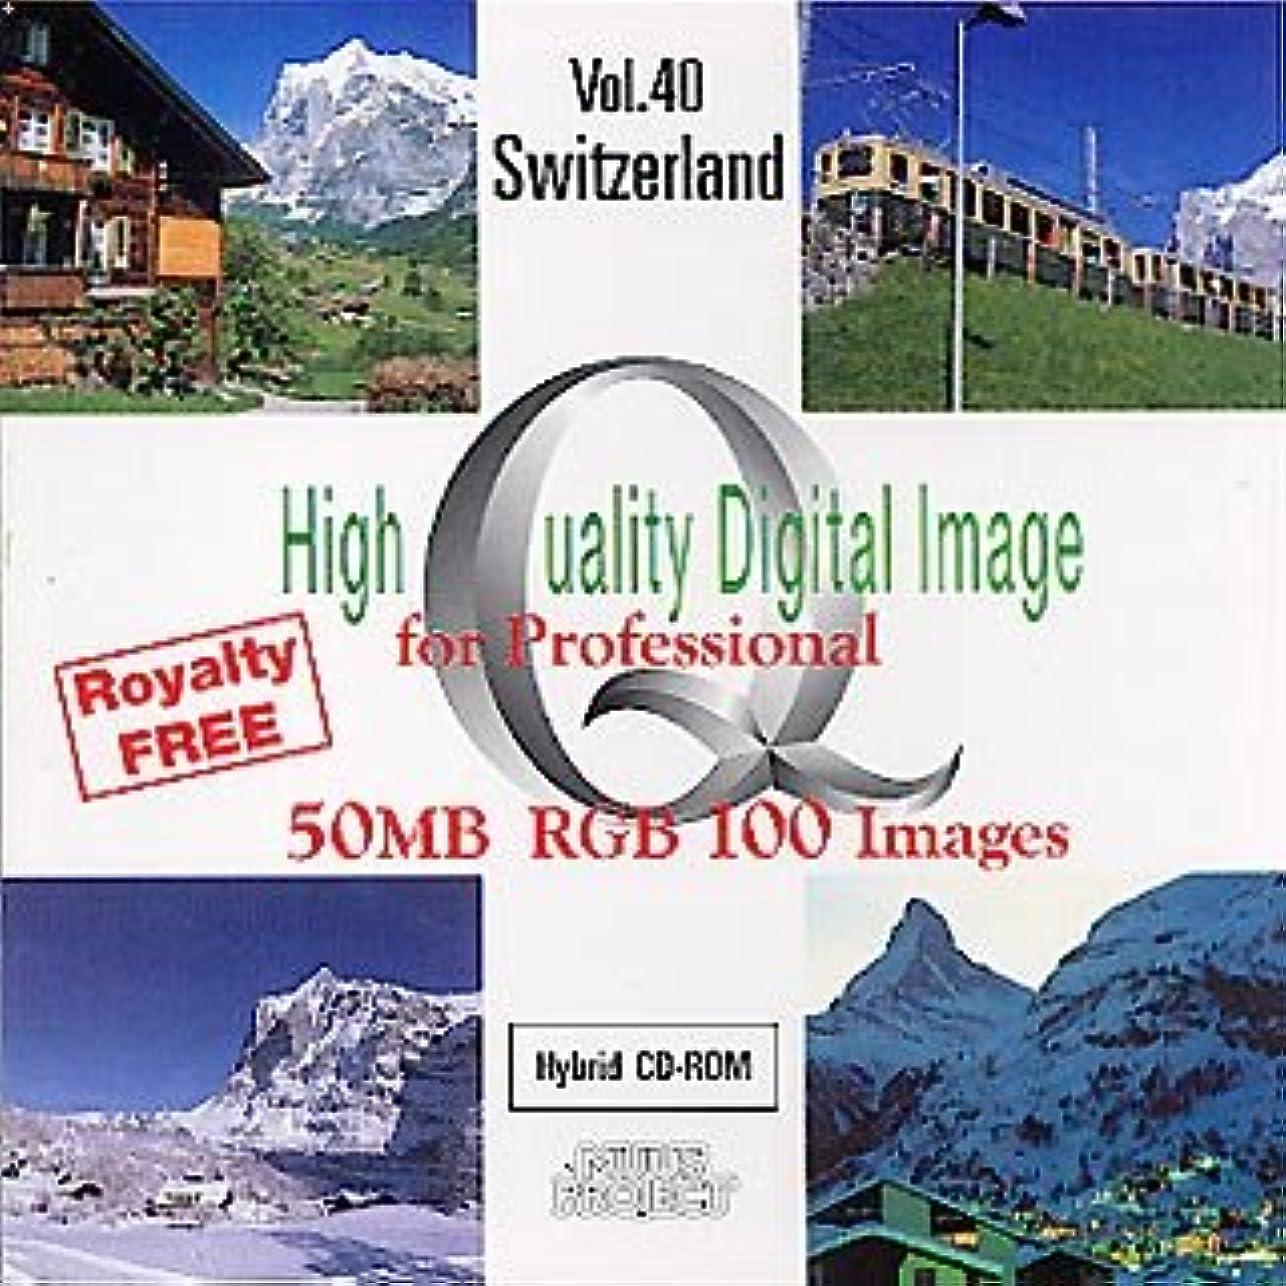 High Quality Digital Image for Professional Vol.40 Switzerland